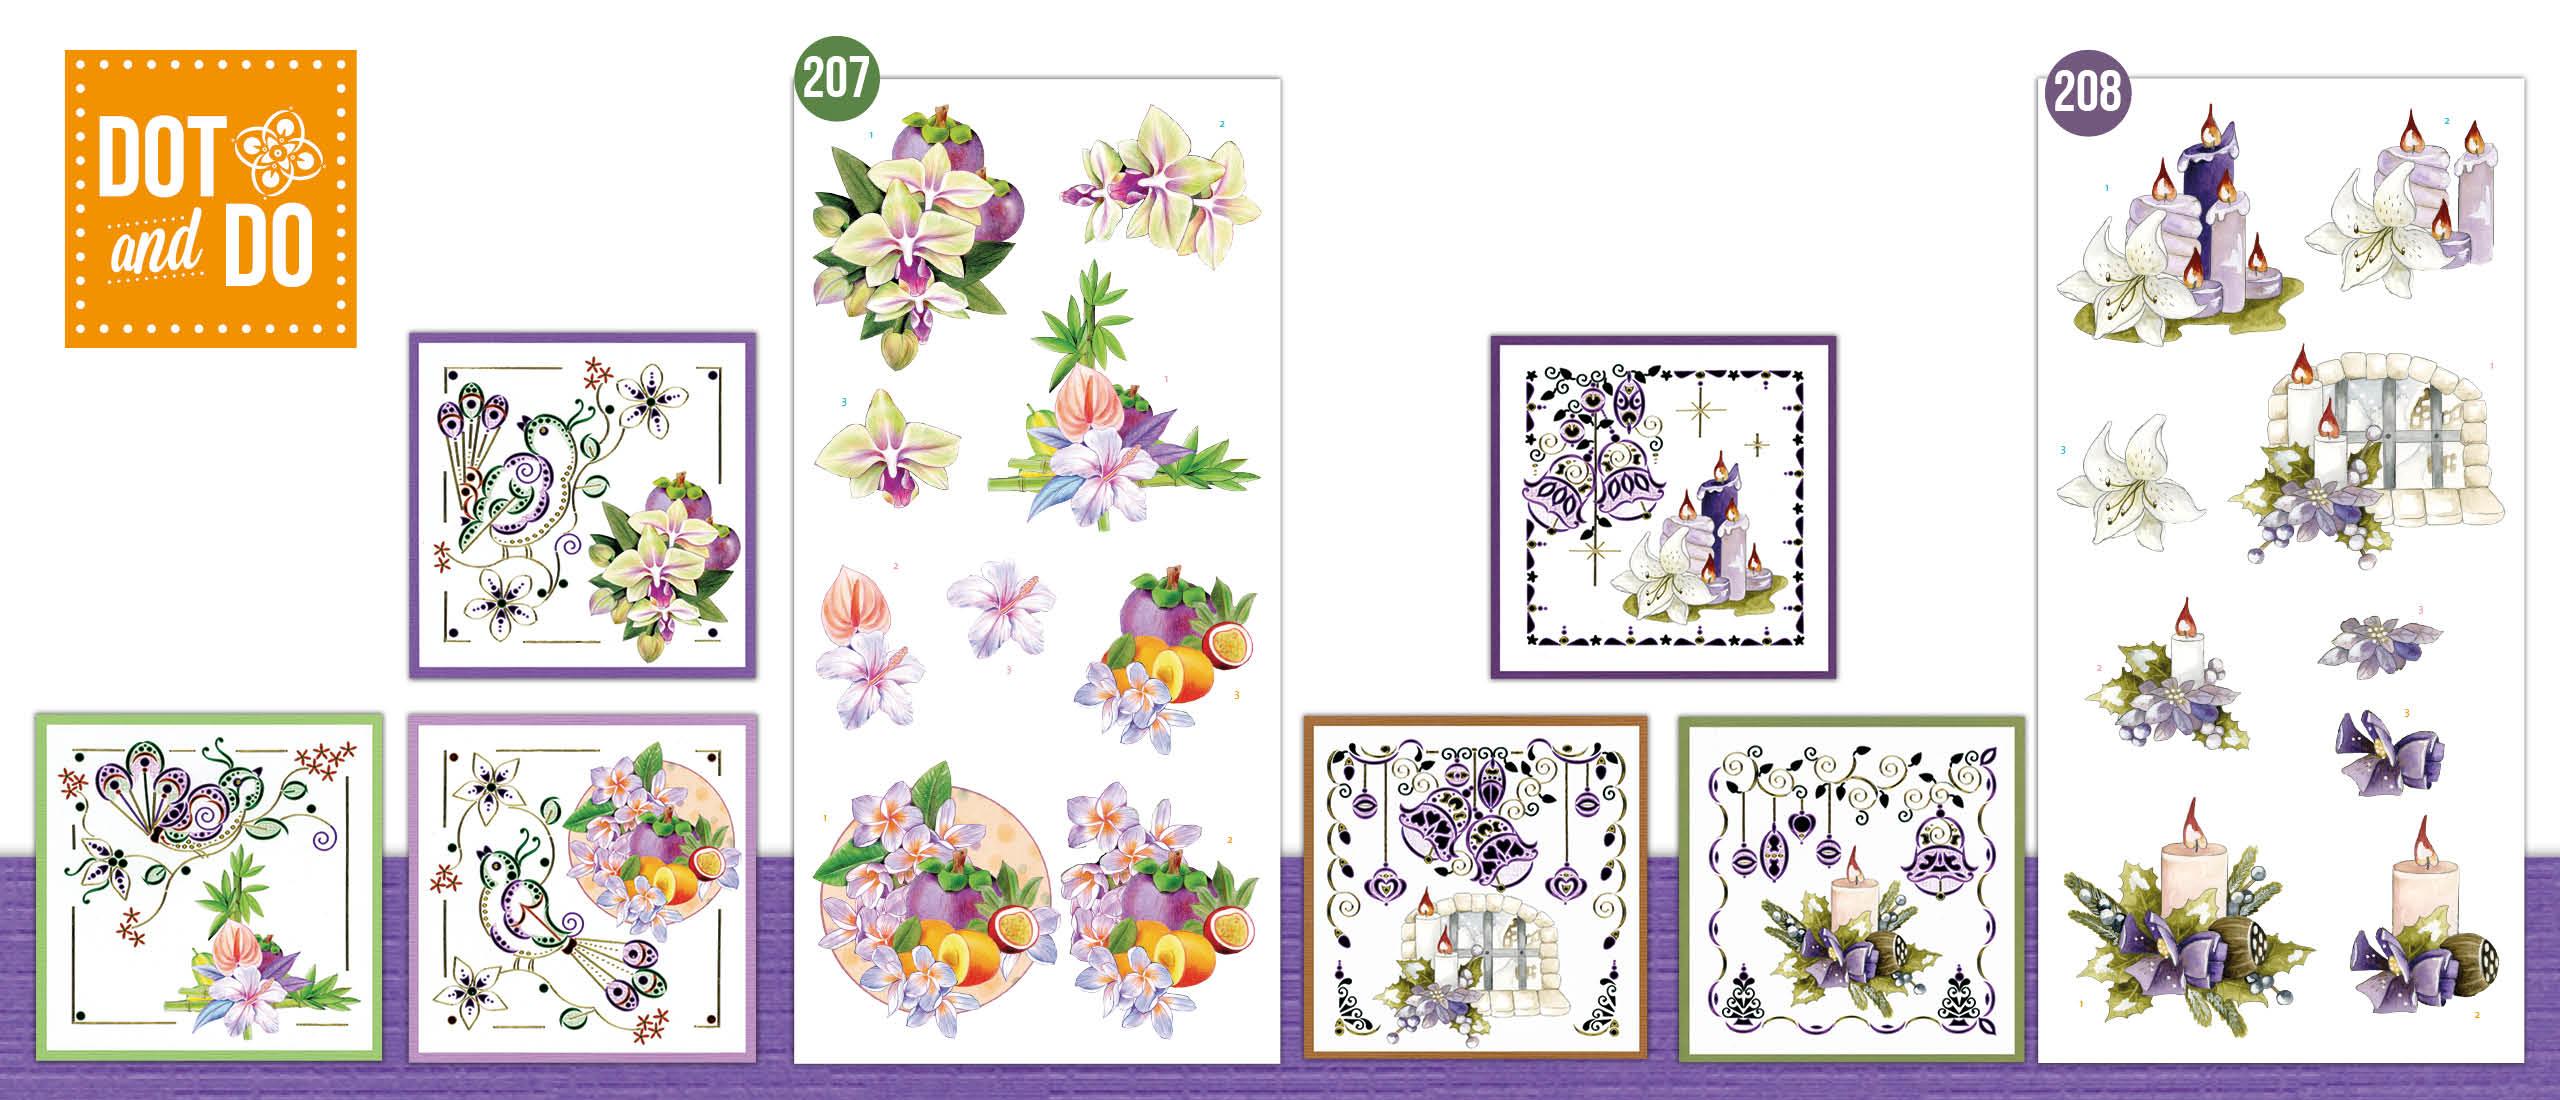 Dot and Do 207 en 208 Exotic Flowers en The Best Christmas Ever